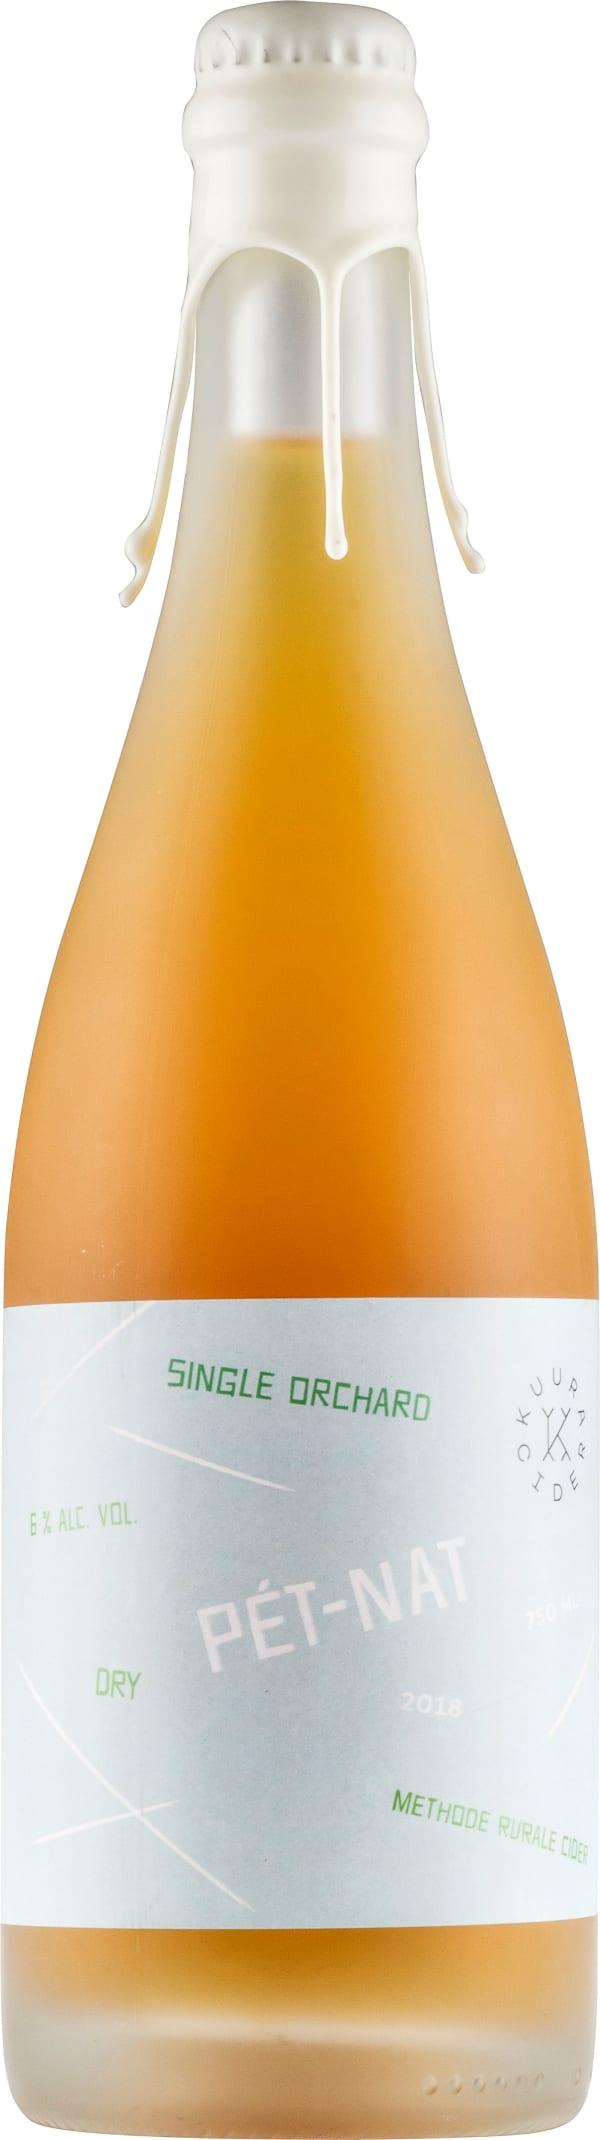 Kuura Single Orchard Pét-Nat Dry Cider 2018